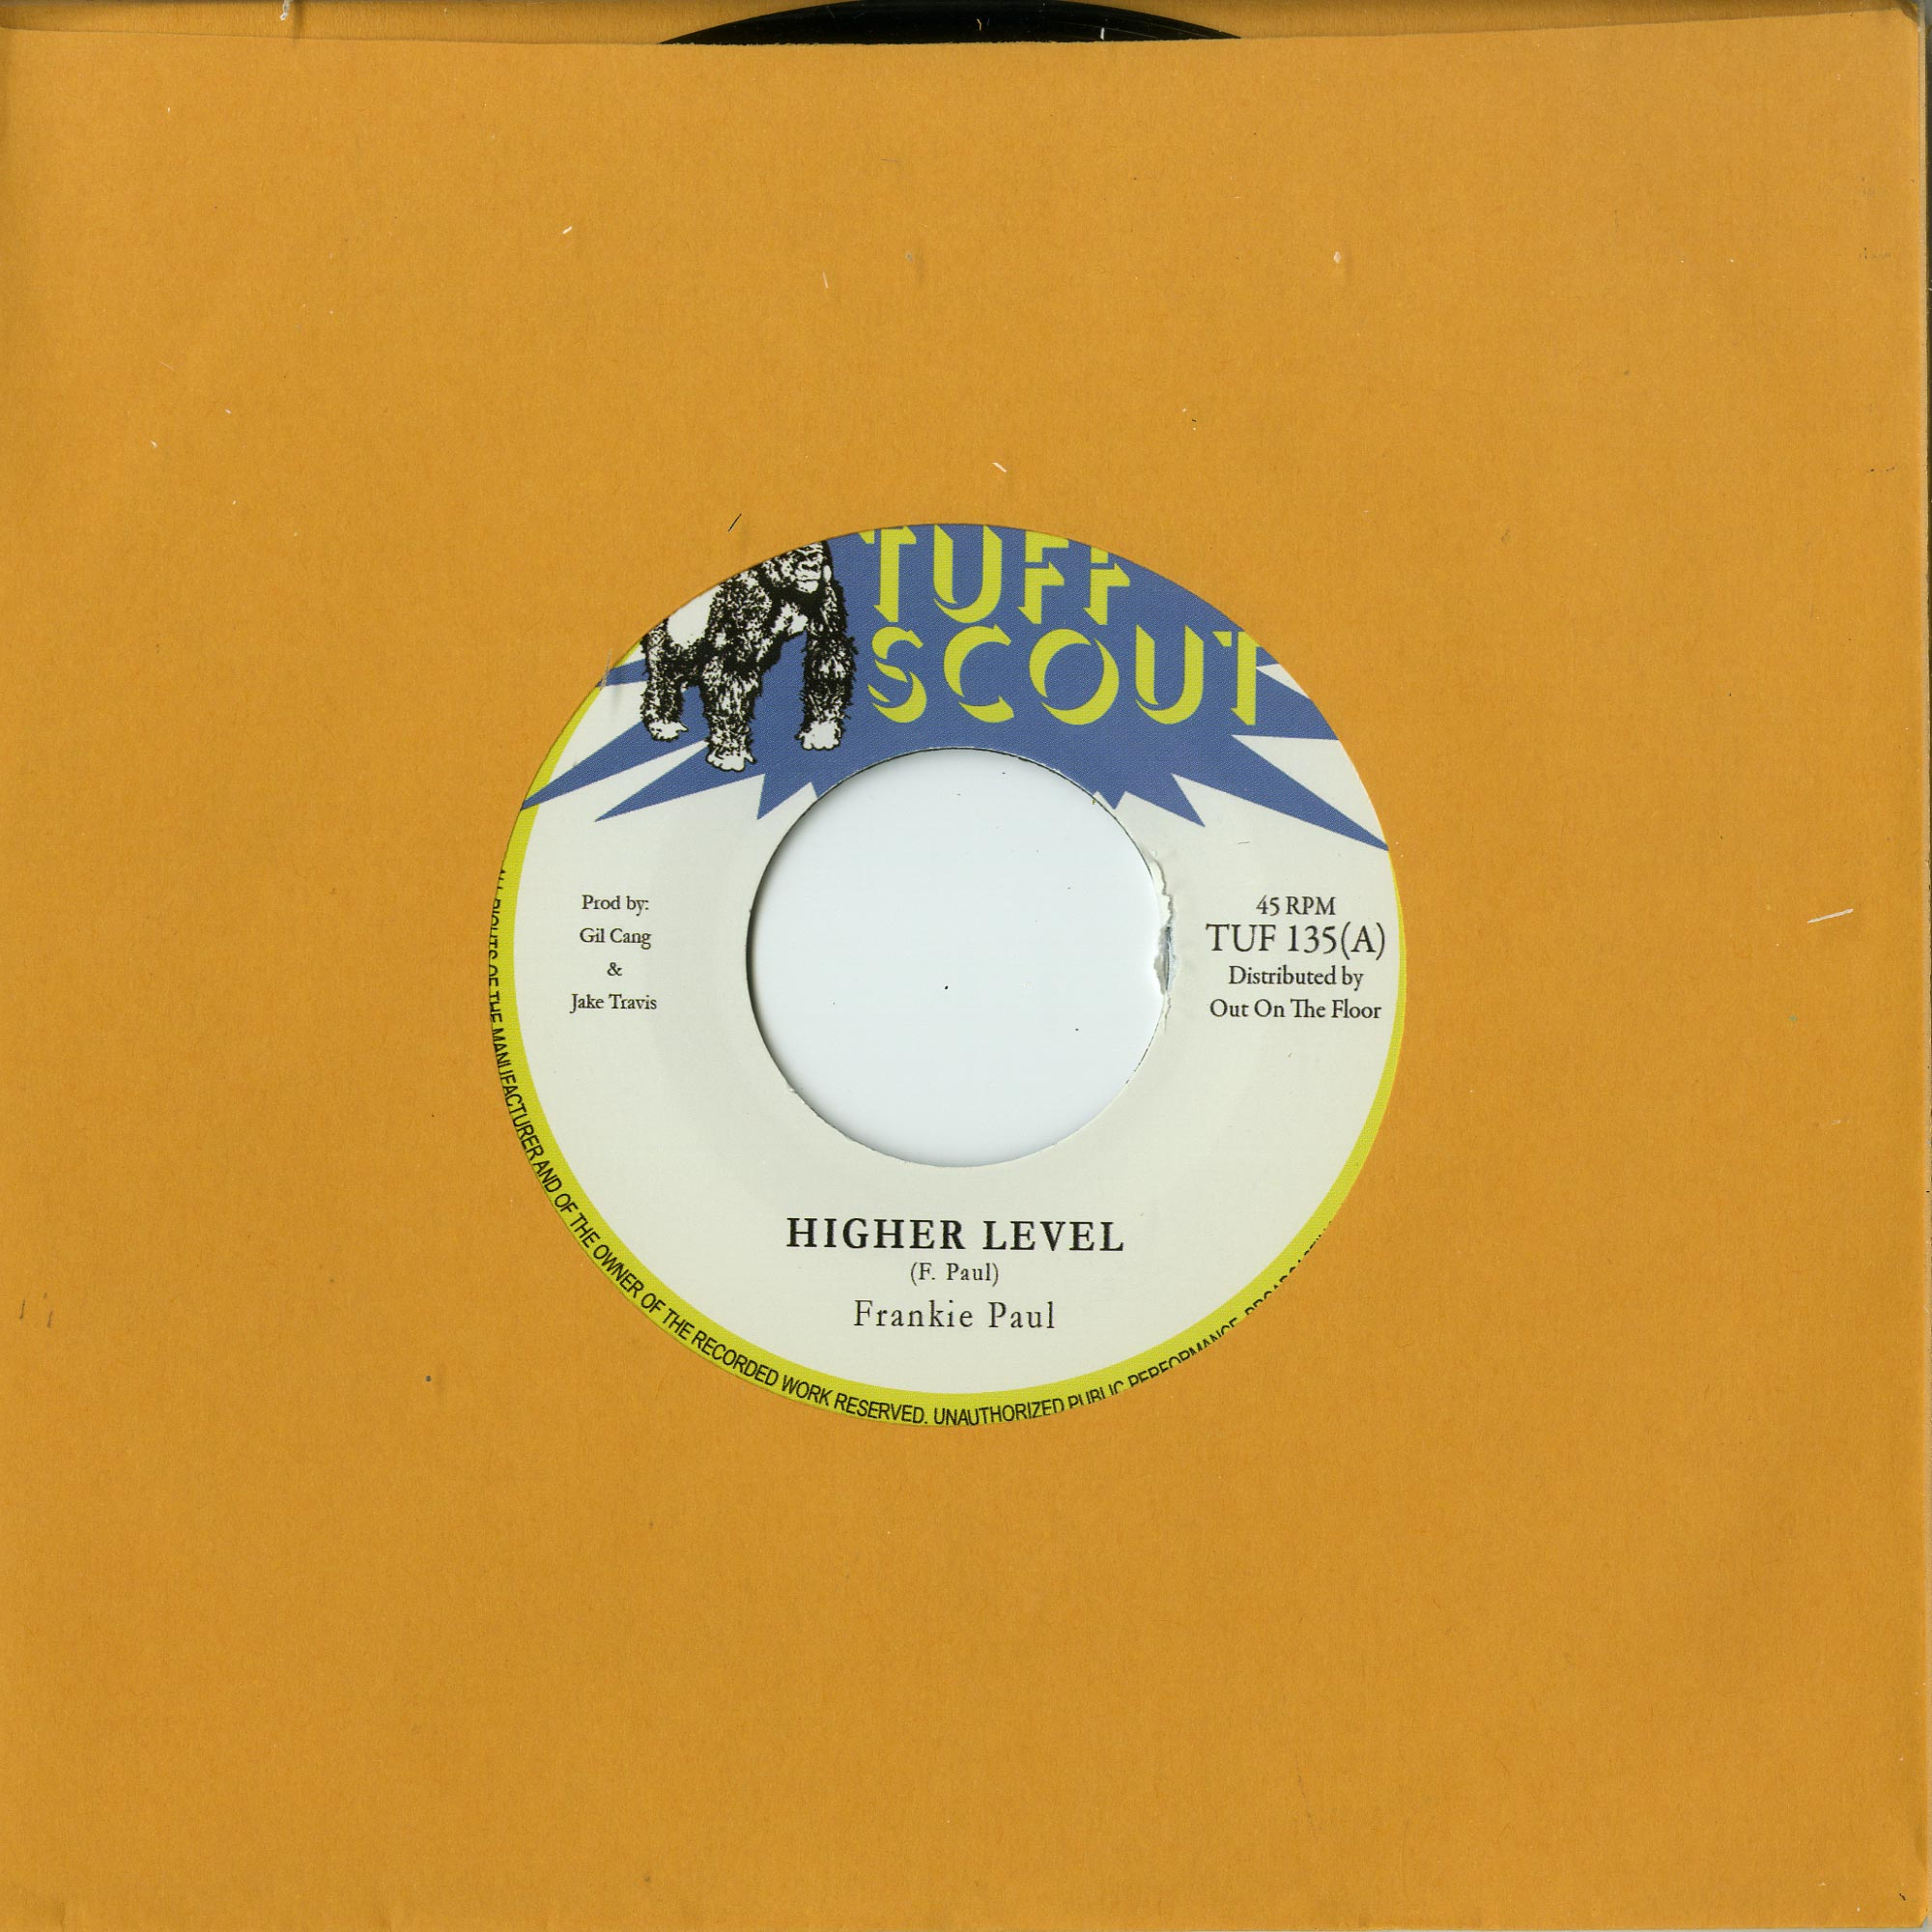 Frankie Paul - HIGHER LEVEL